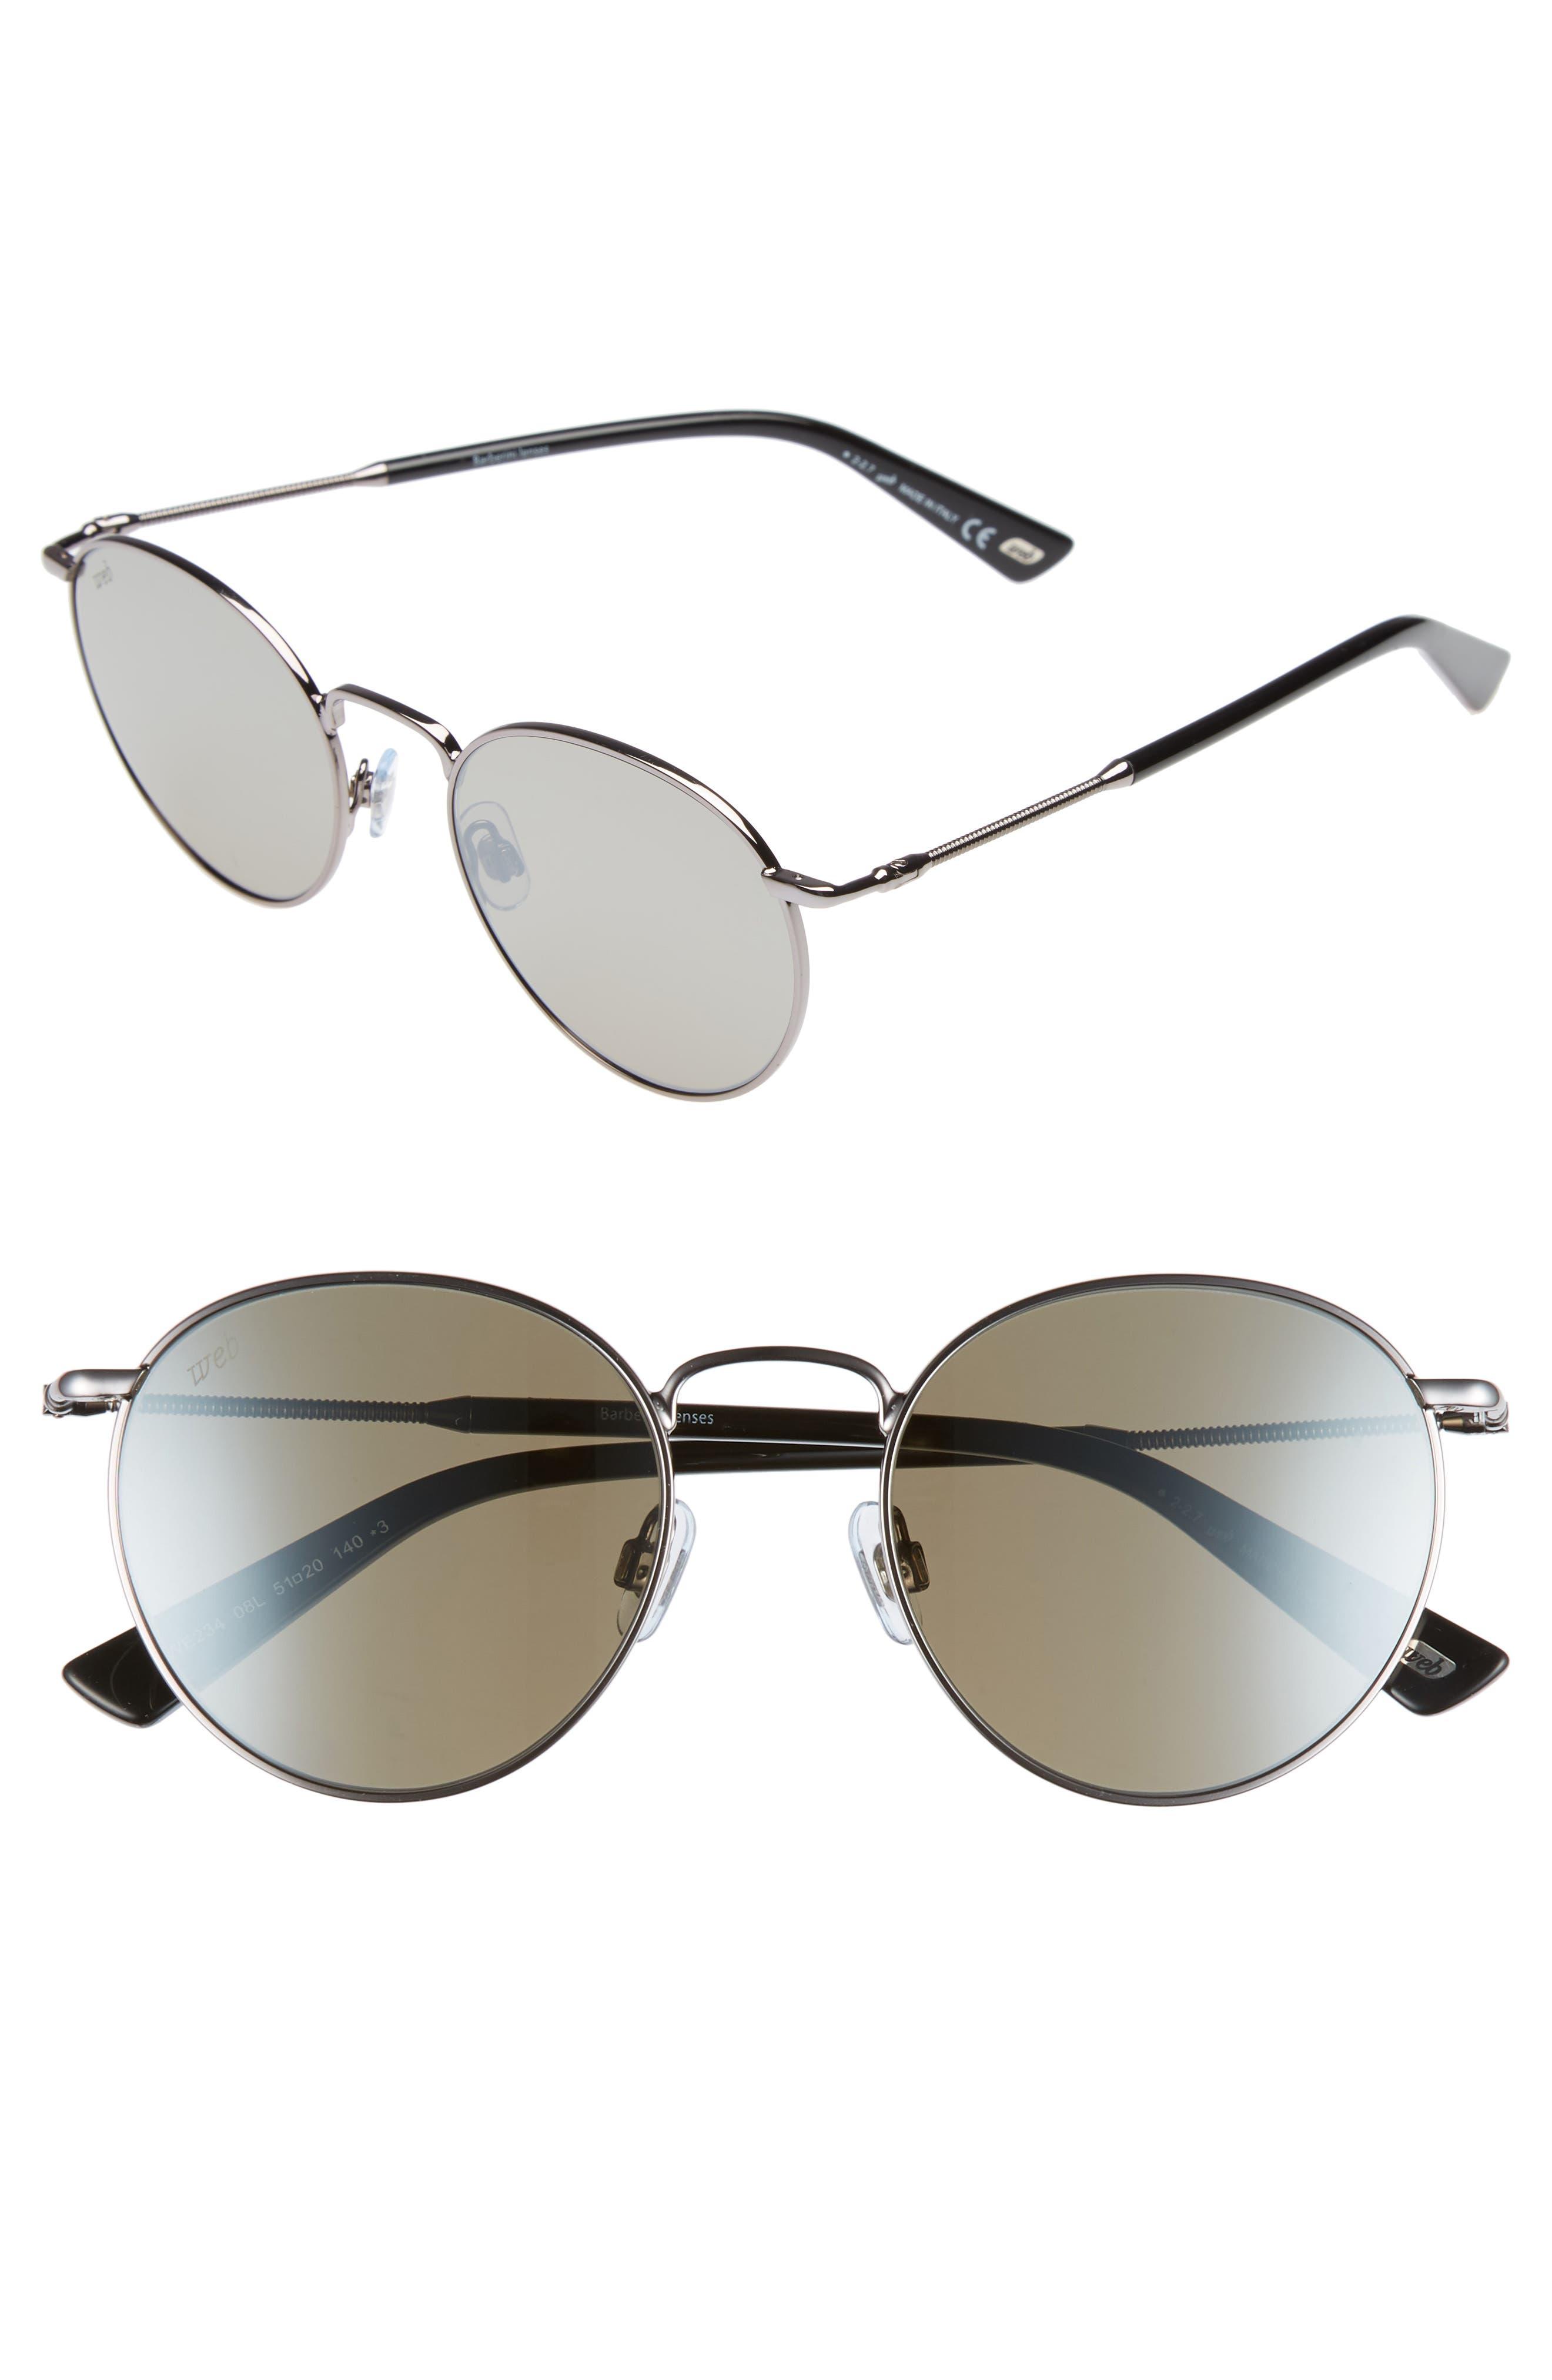 51mm Round Metal Sunglasses,                         Main,                         color, SHINY GUNMETAL/ ROVIEX MIRROR